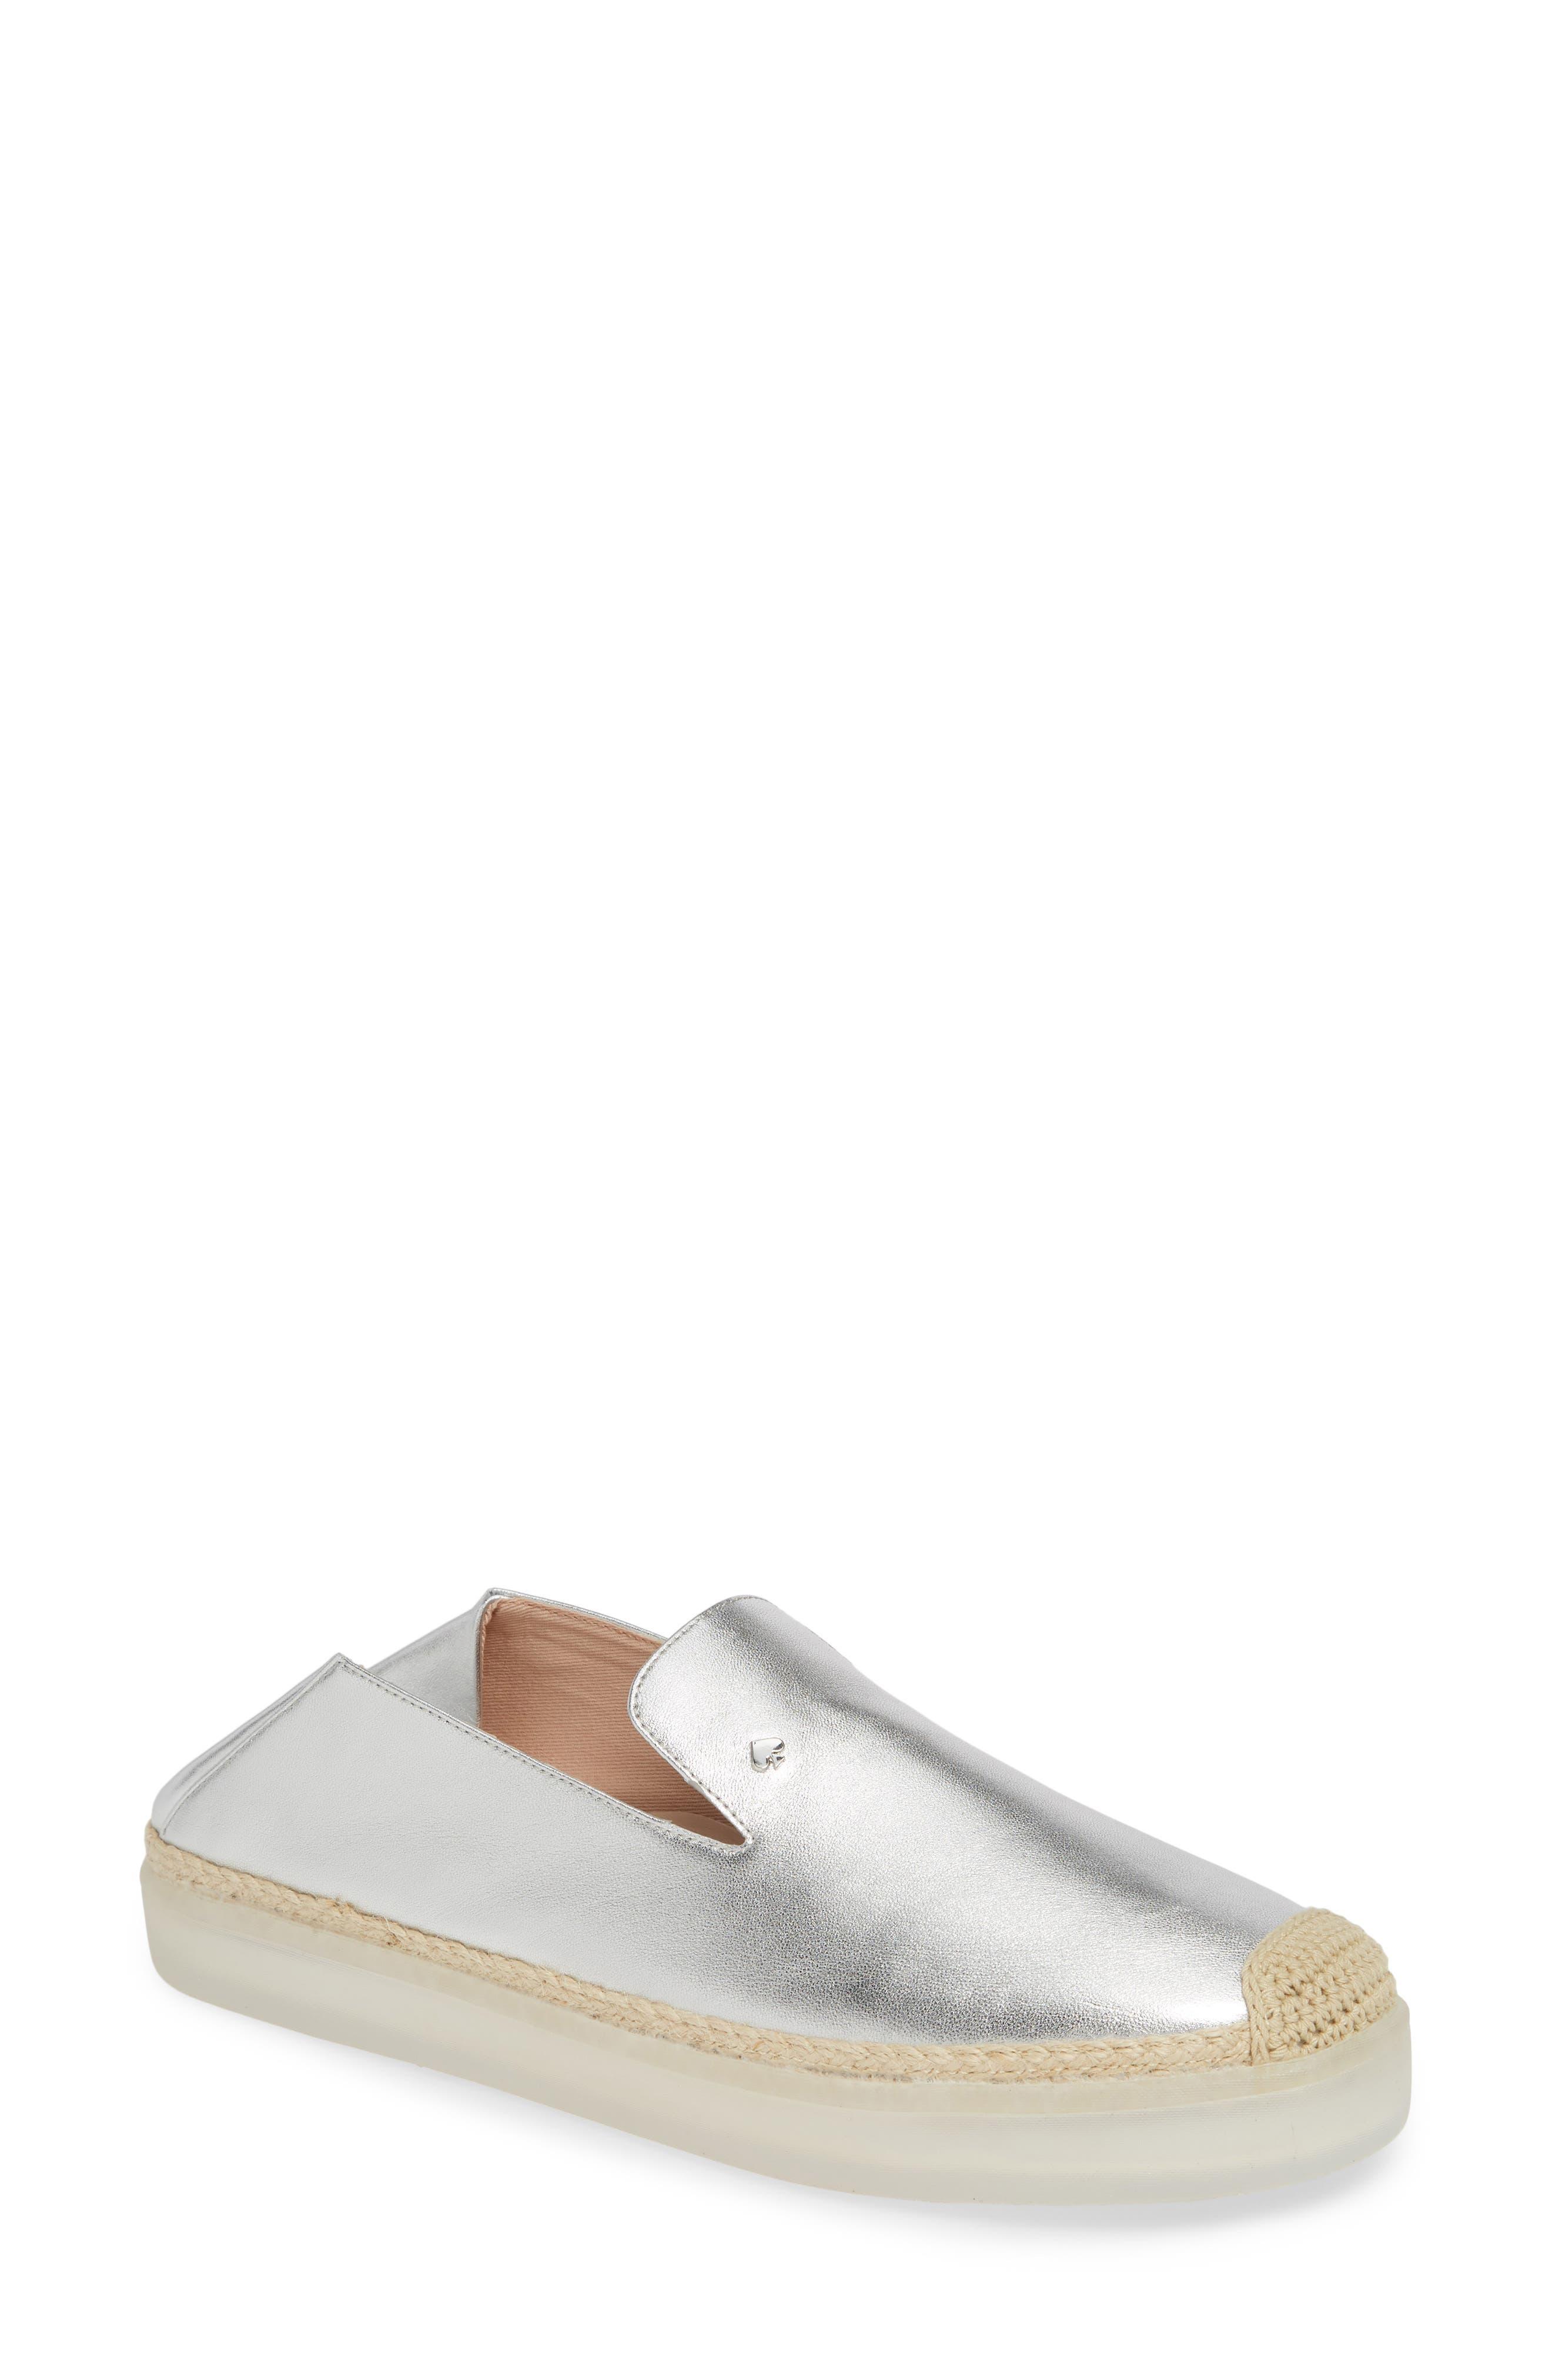 lisa slip-on sneaker, Main, color, SILVER